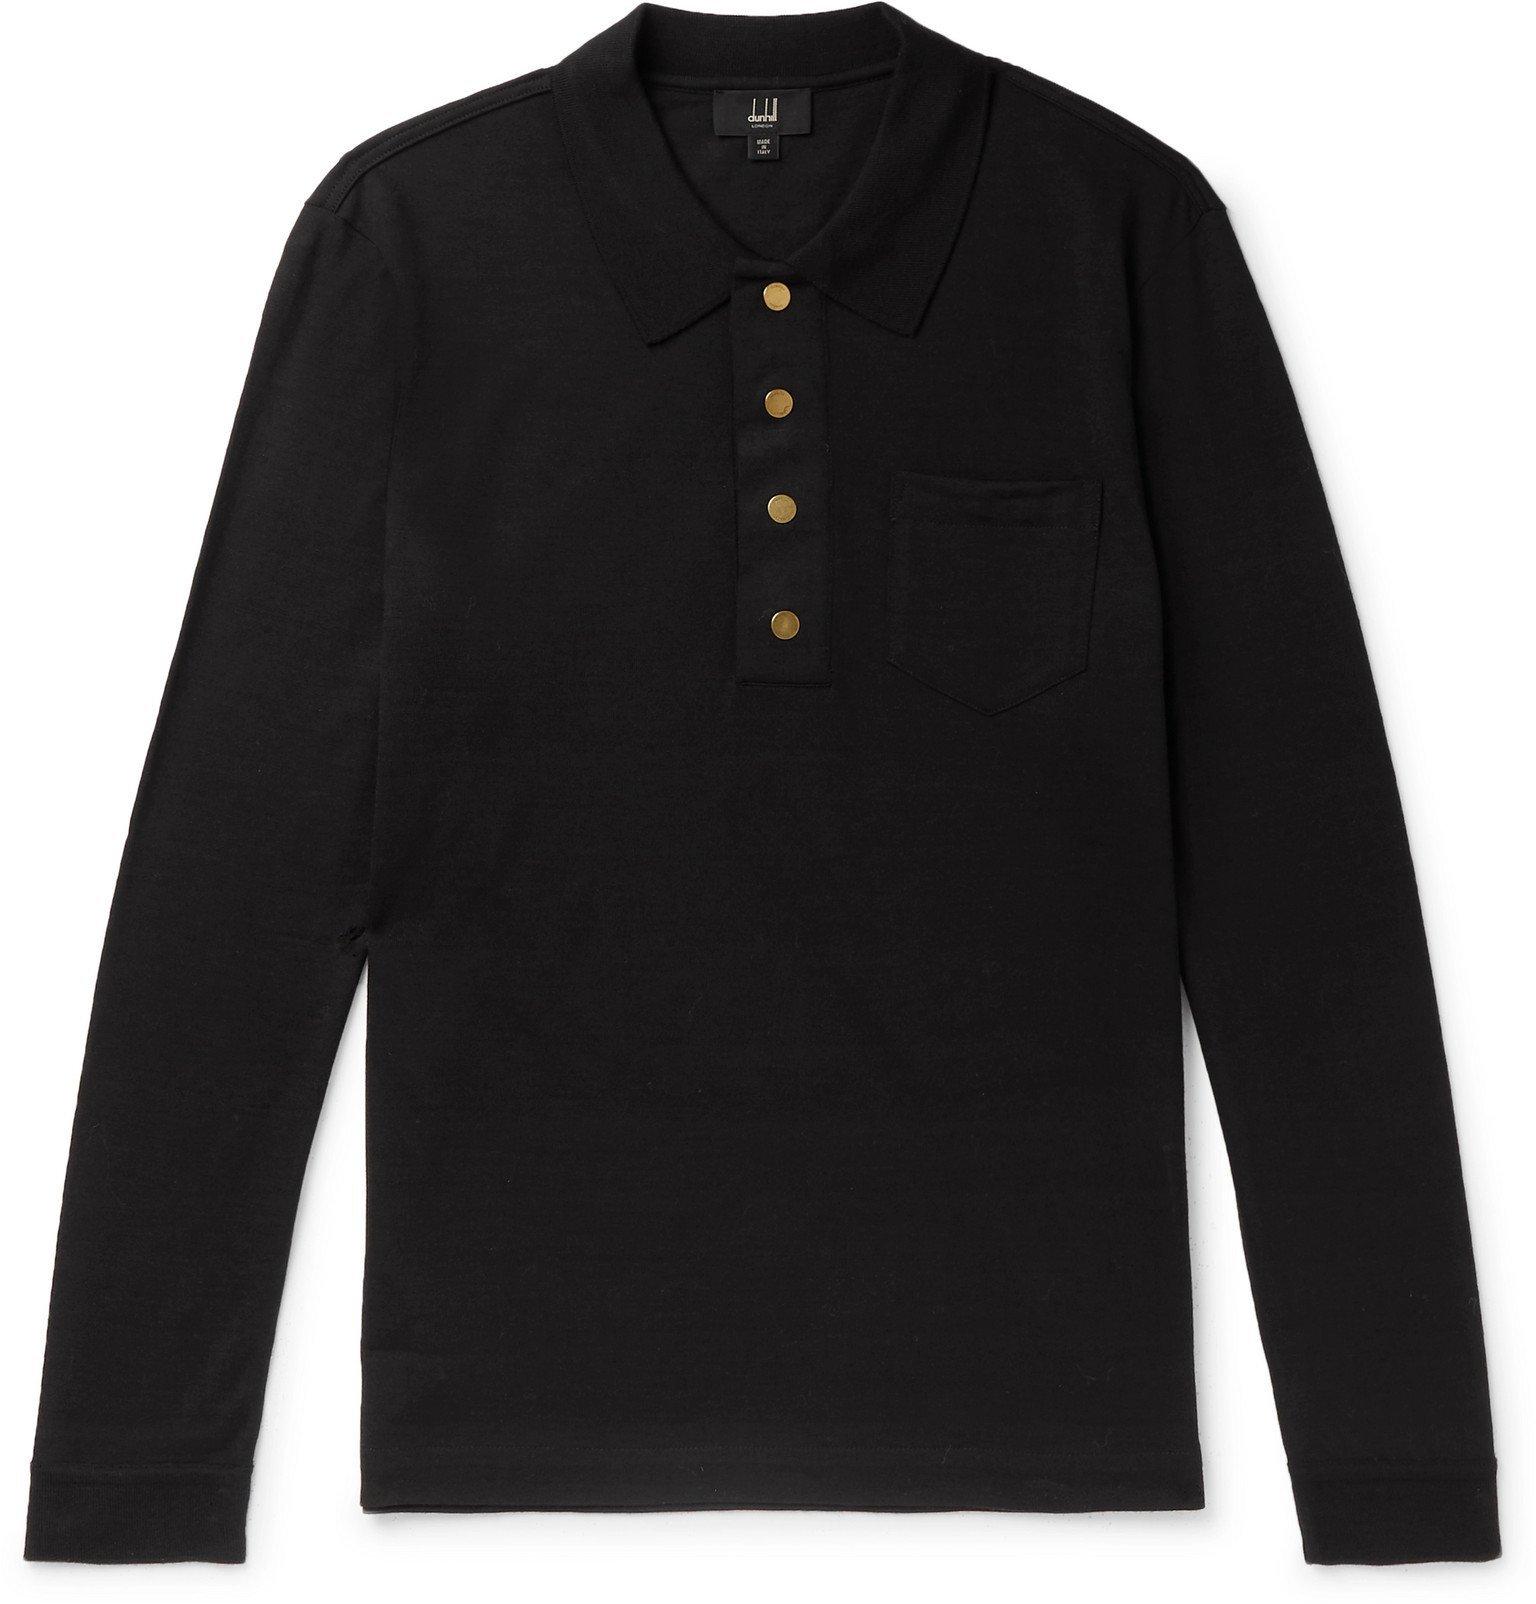 Dunhill - Wool Polo Shirt - Black